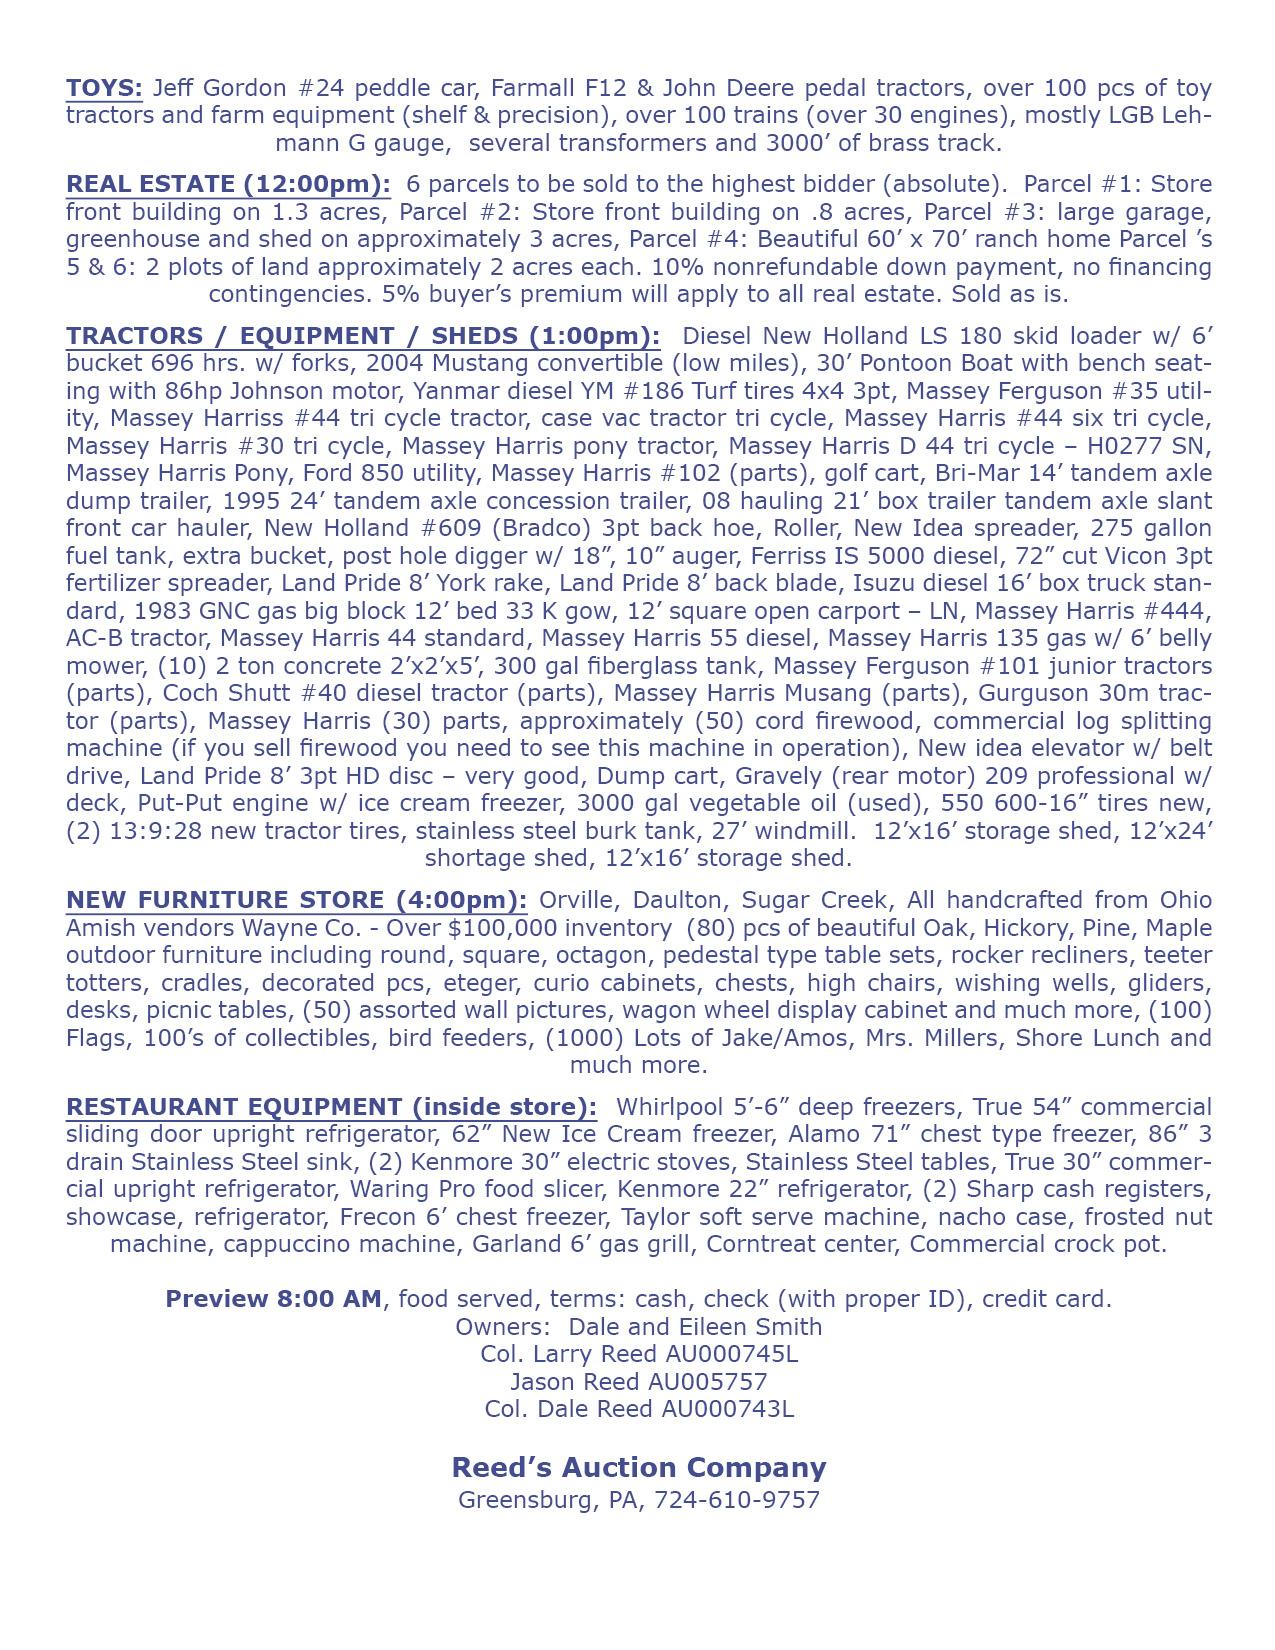 Auction Flyer 6-6-152.jpg